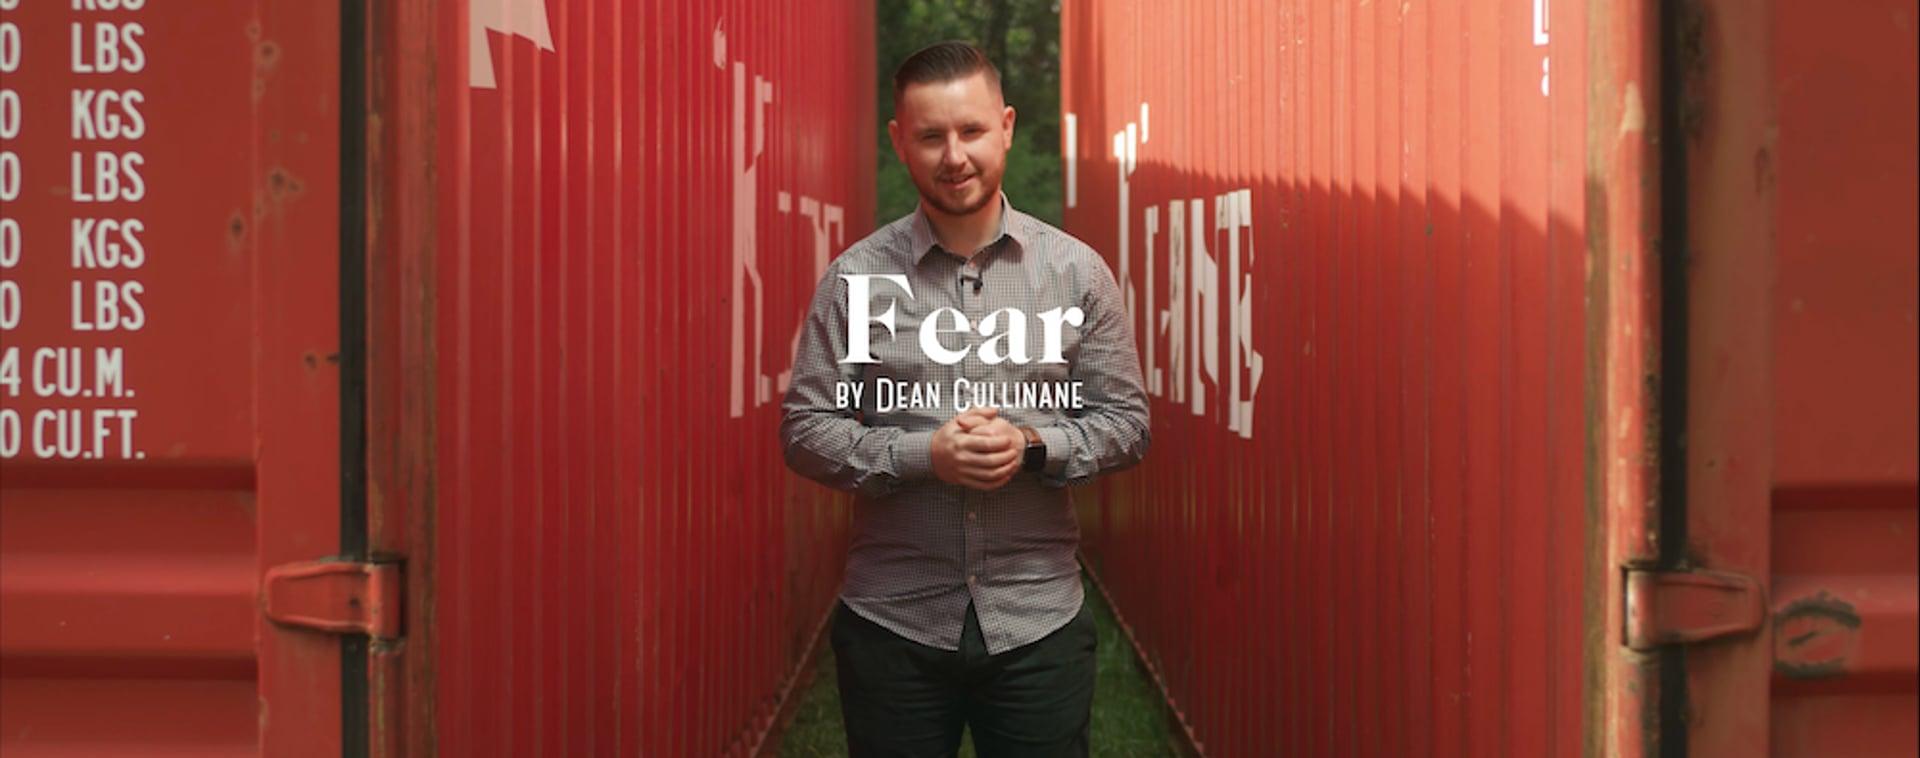 Fear | Dean Cullinane